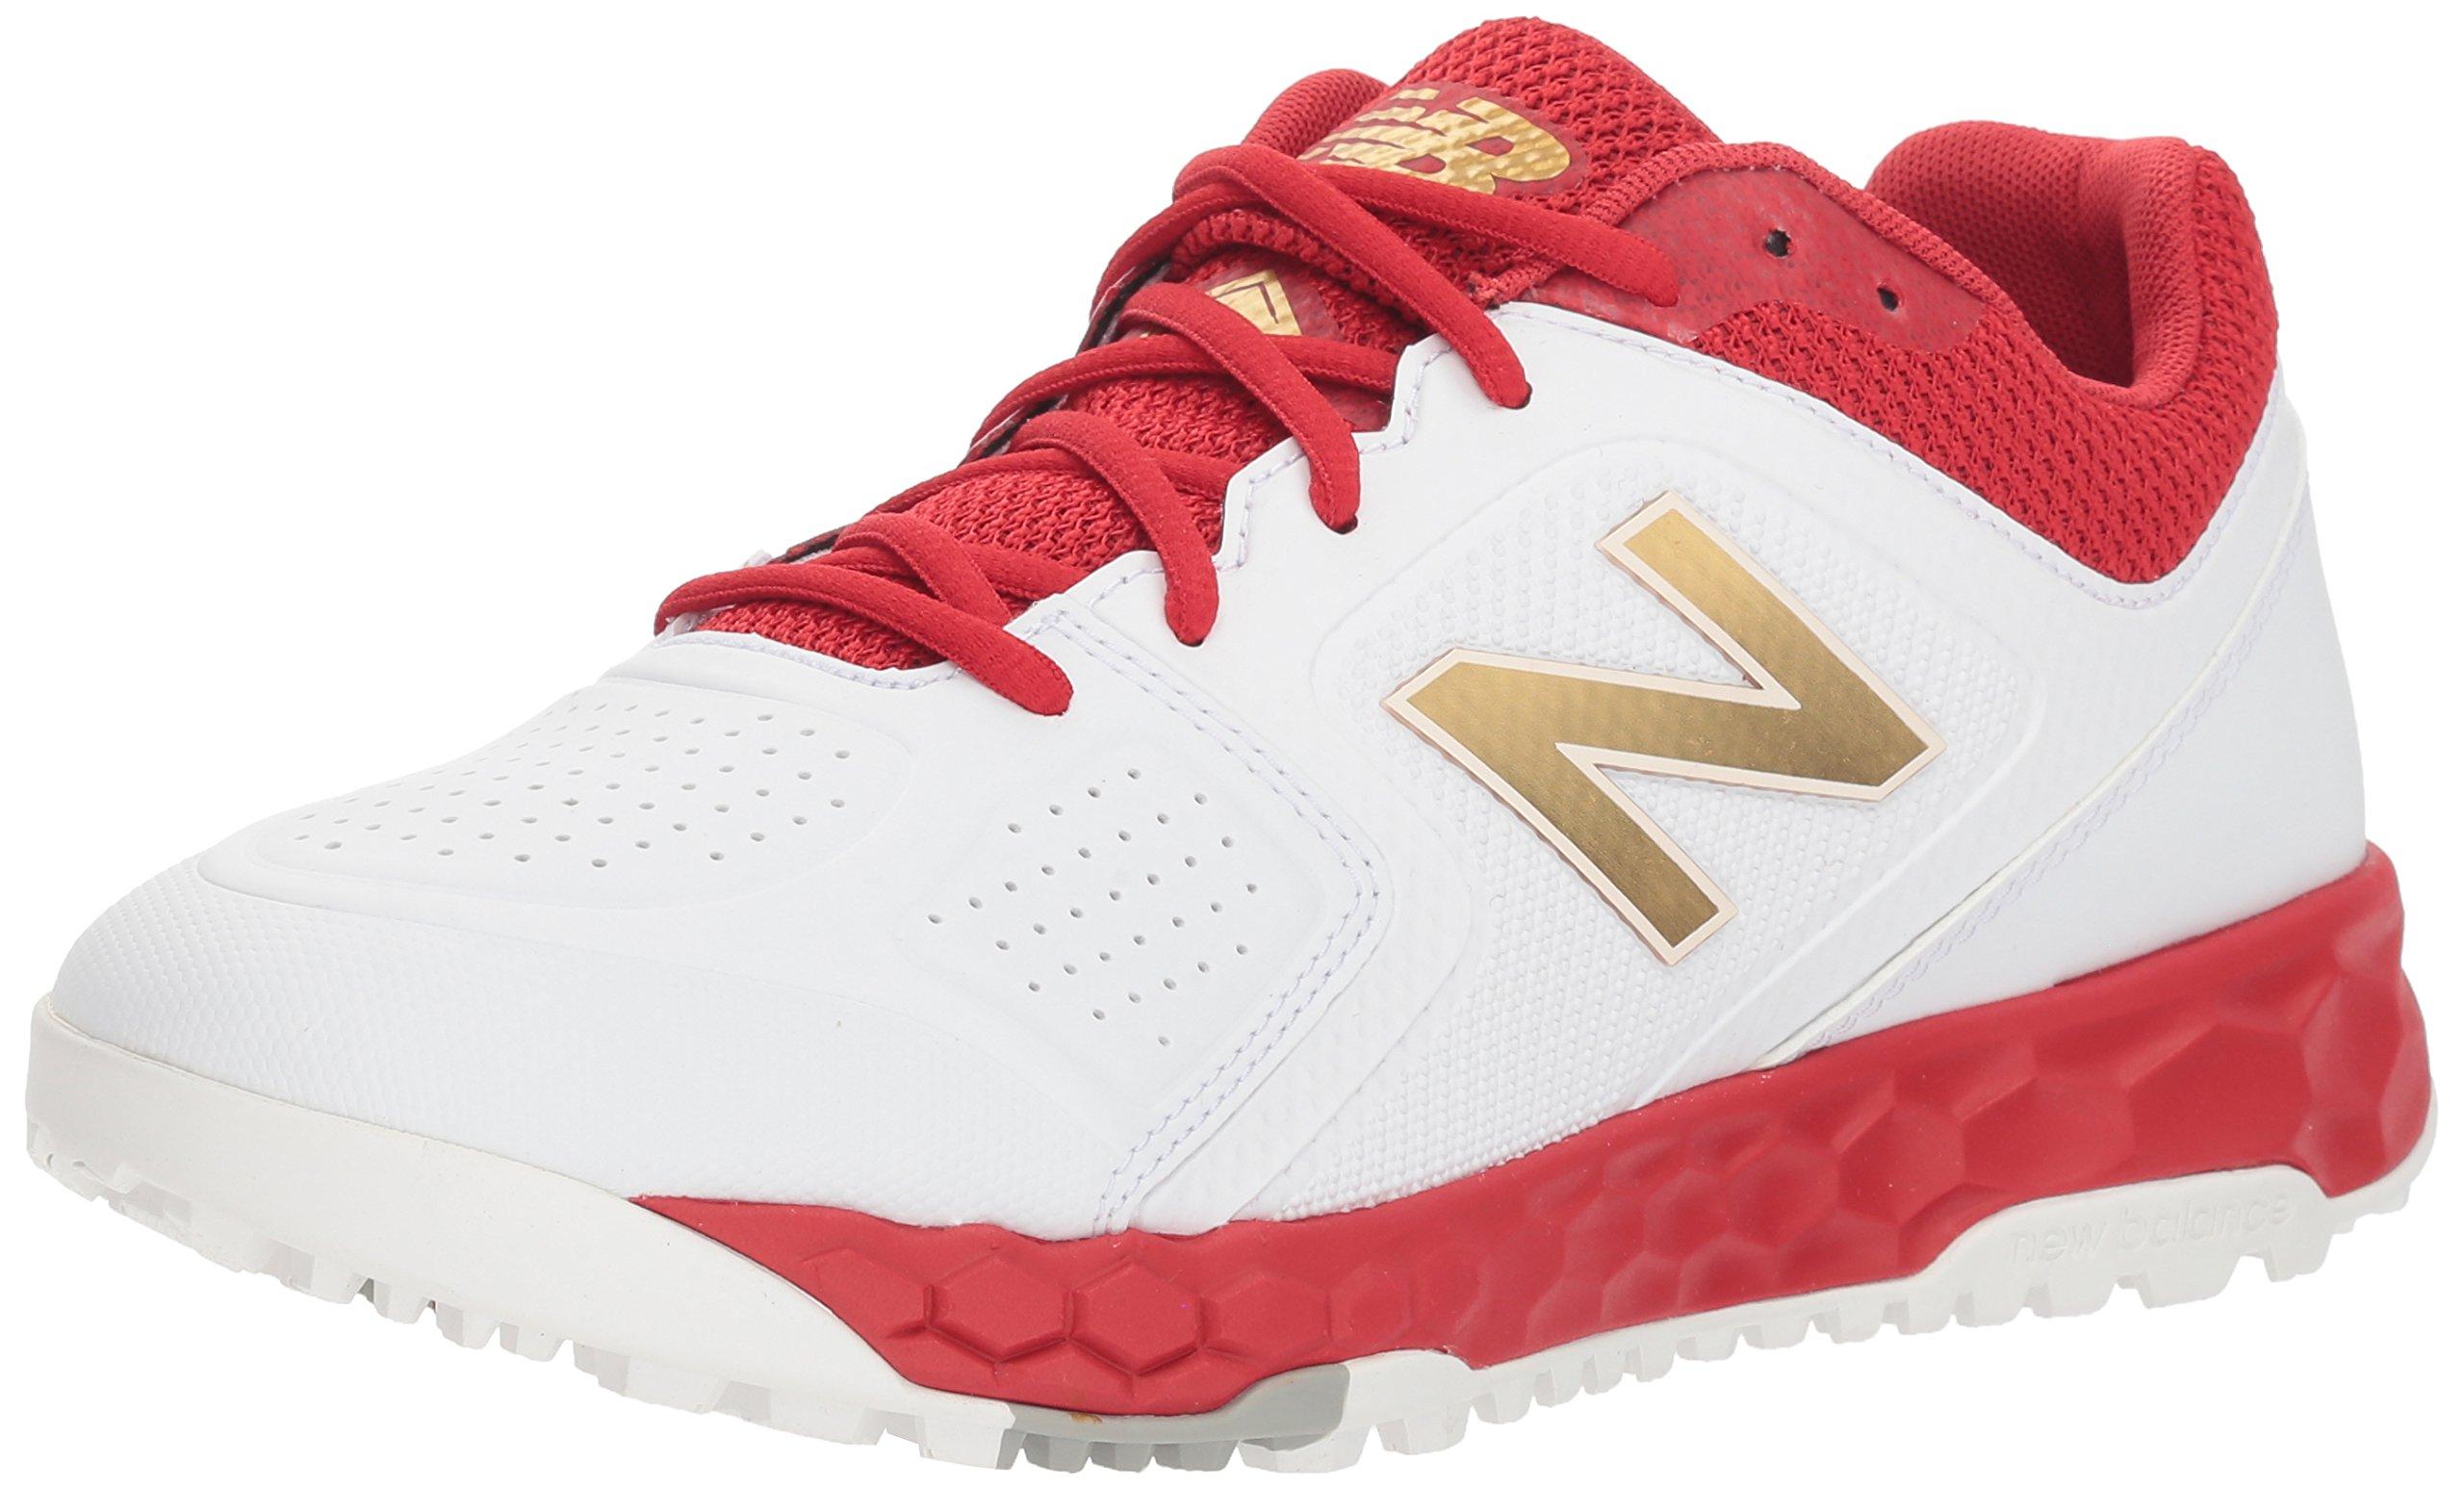 New Balance Women's Velo V1 Turf Softball Shoe, red/White, 10 B US by New Balance